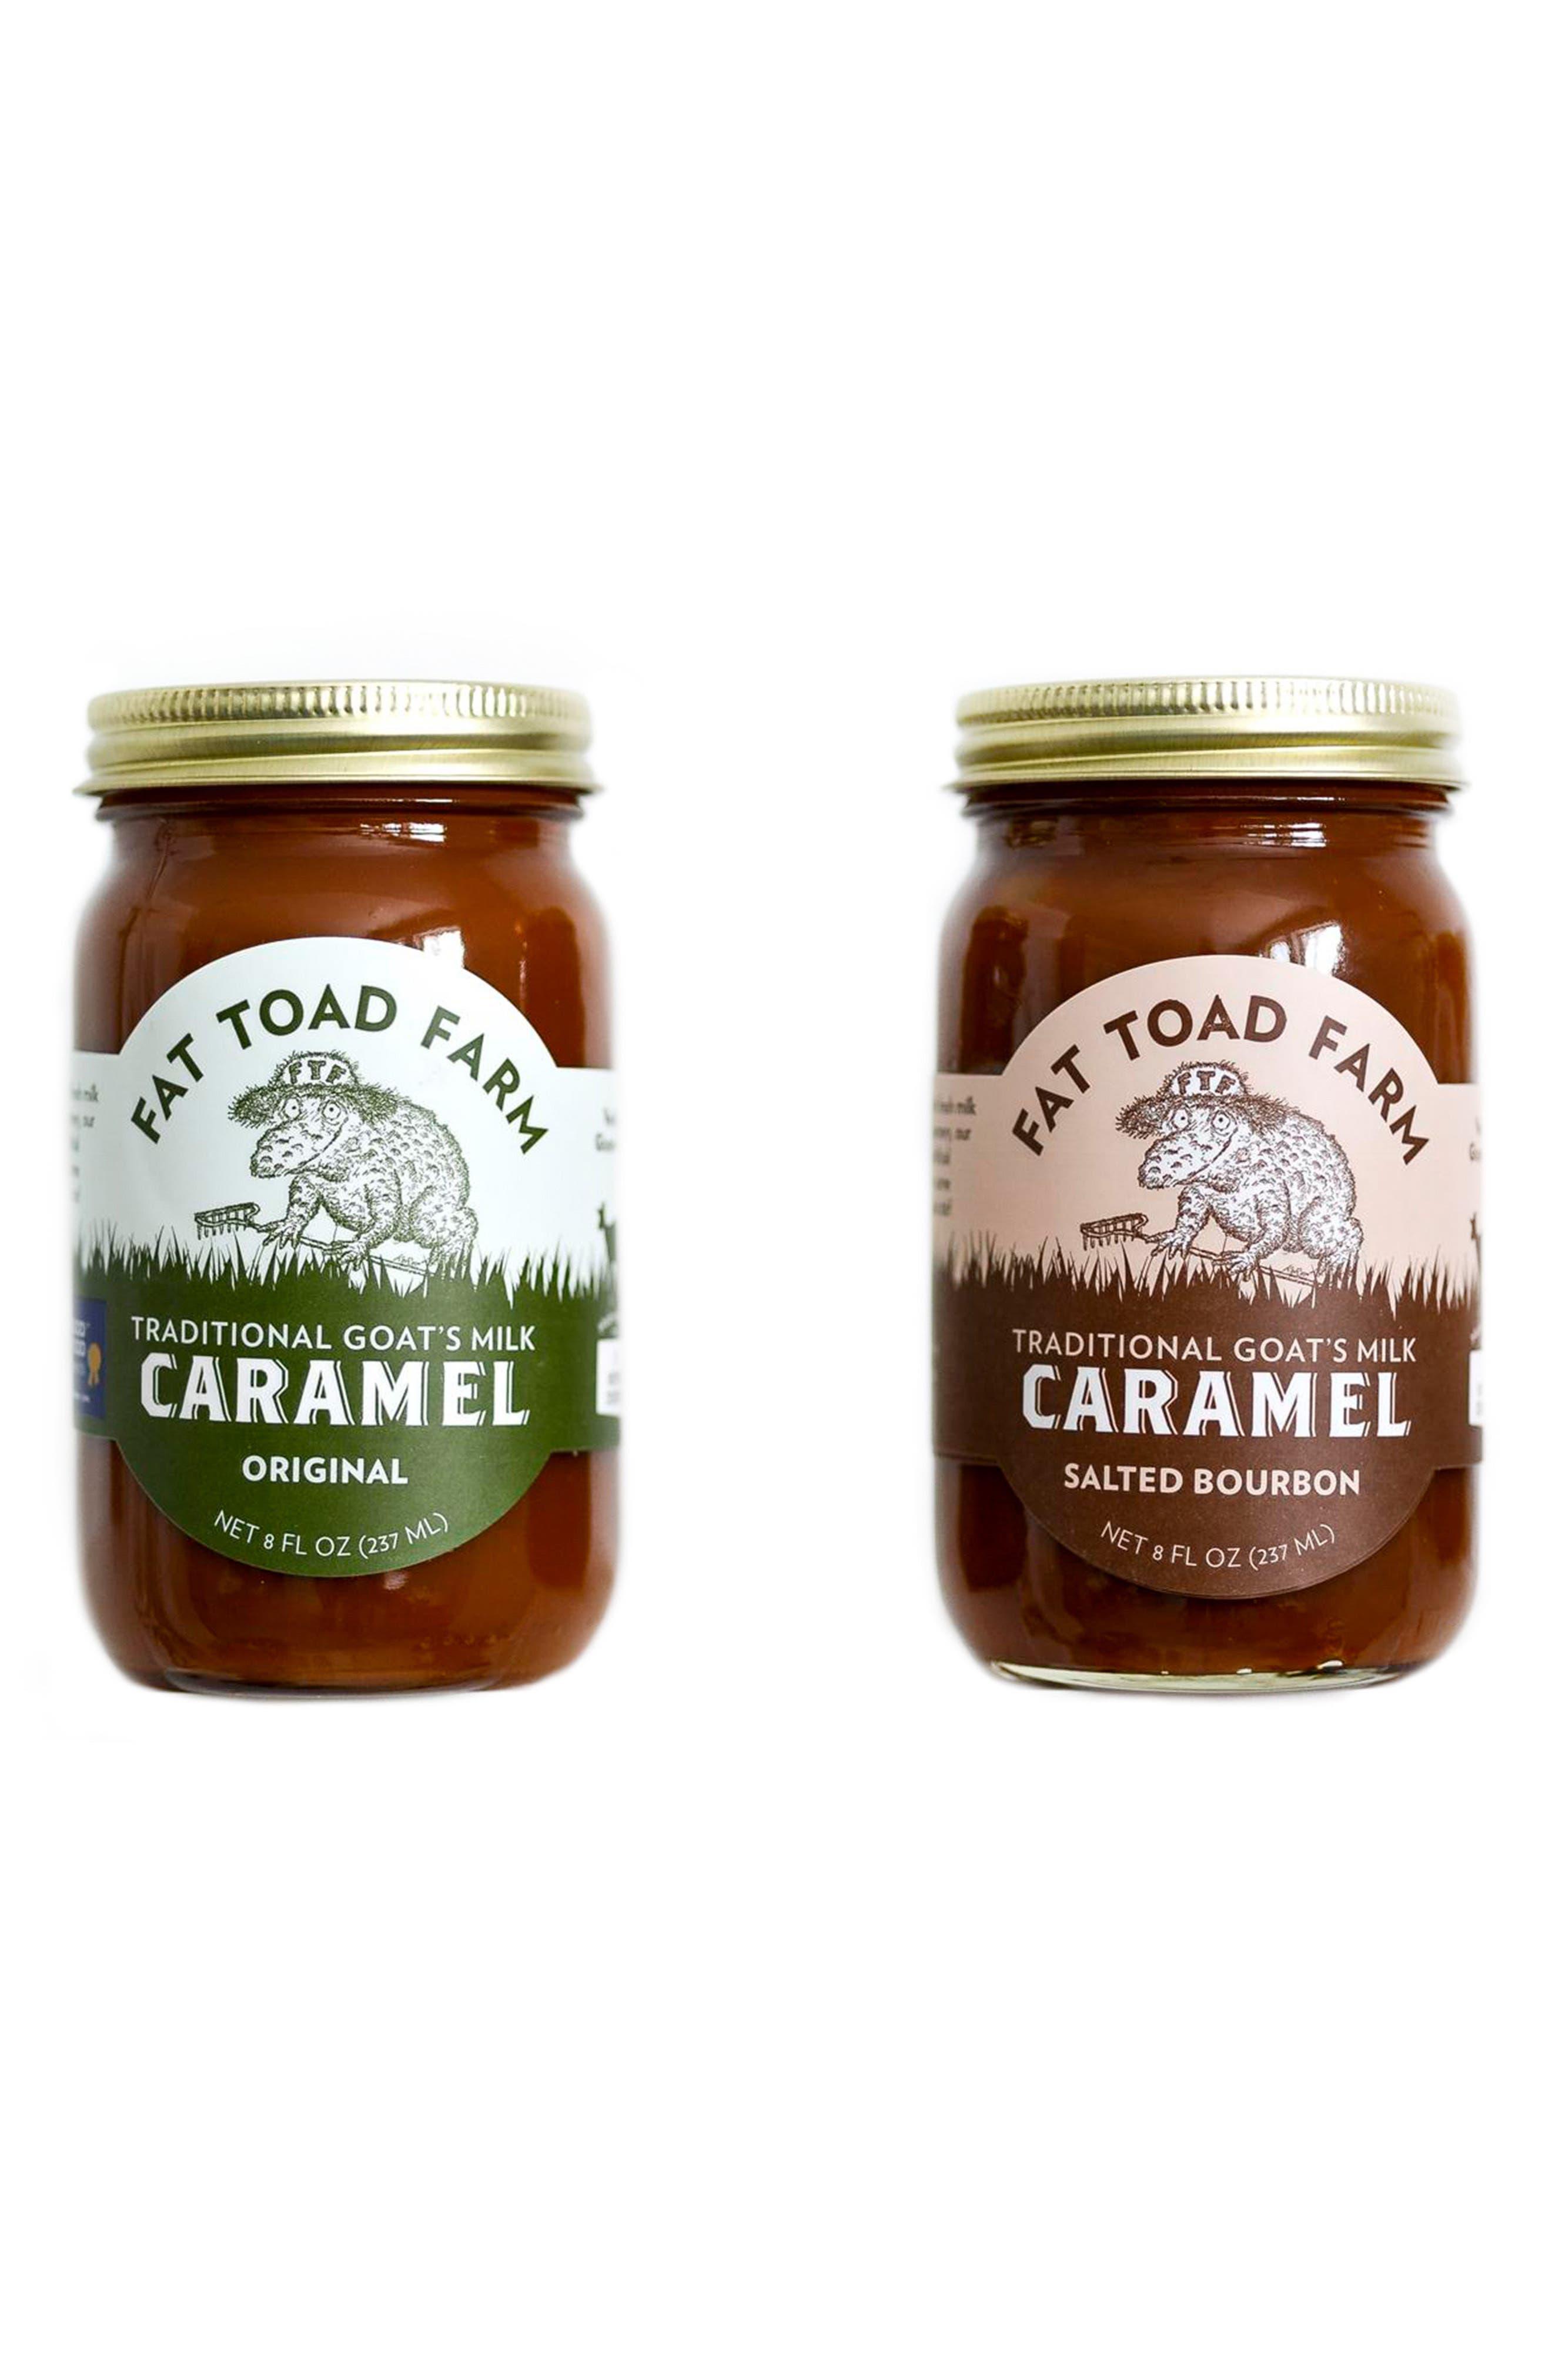 Alternate Image 1 Selected - Fat Toad Farm Classic Goat's Milk Caramel Duo